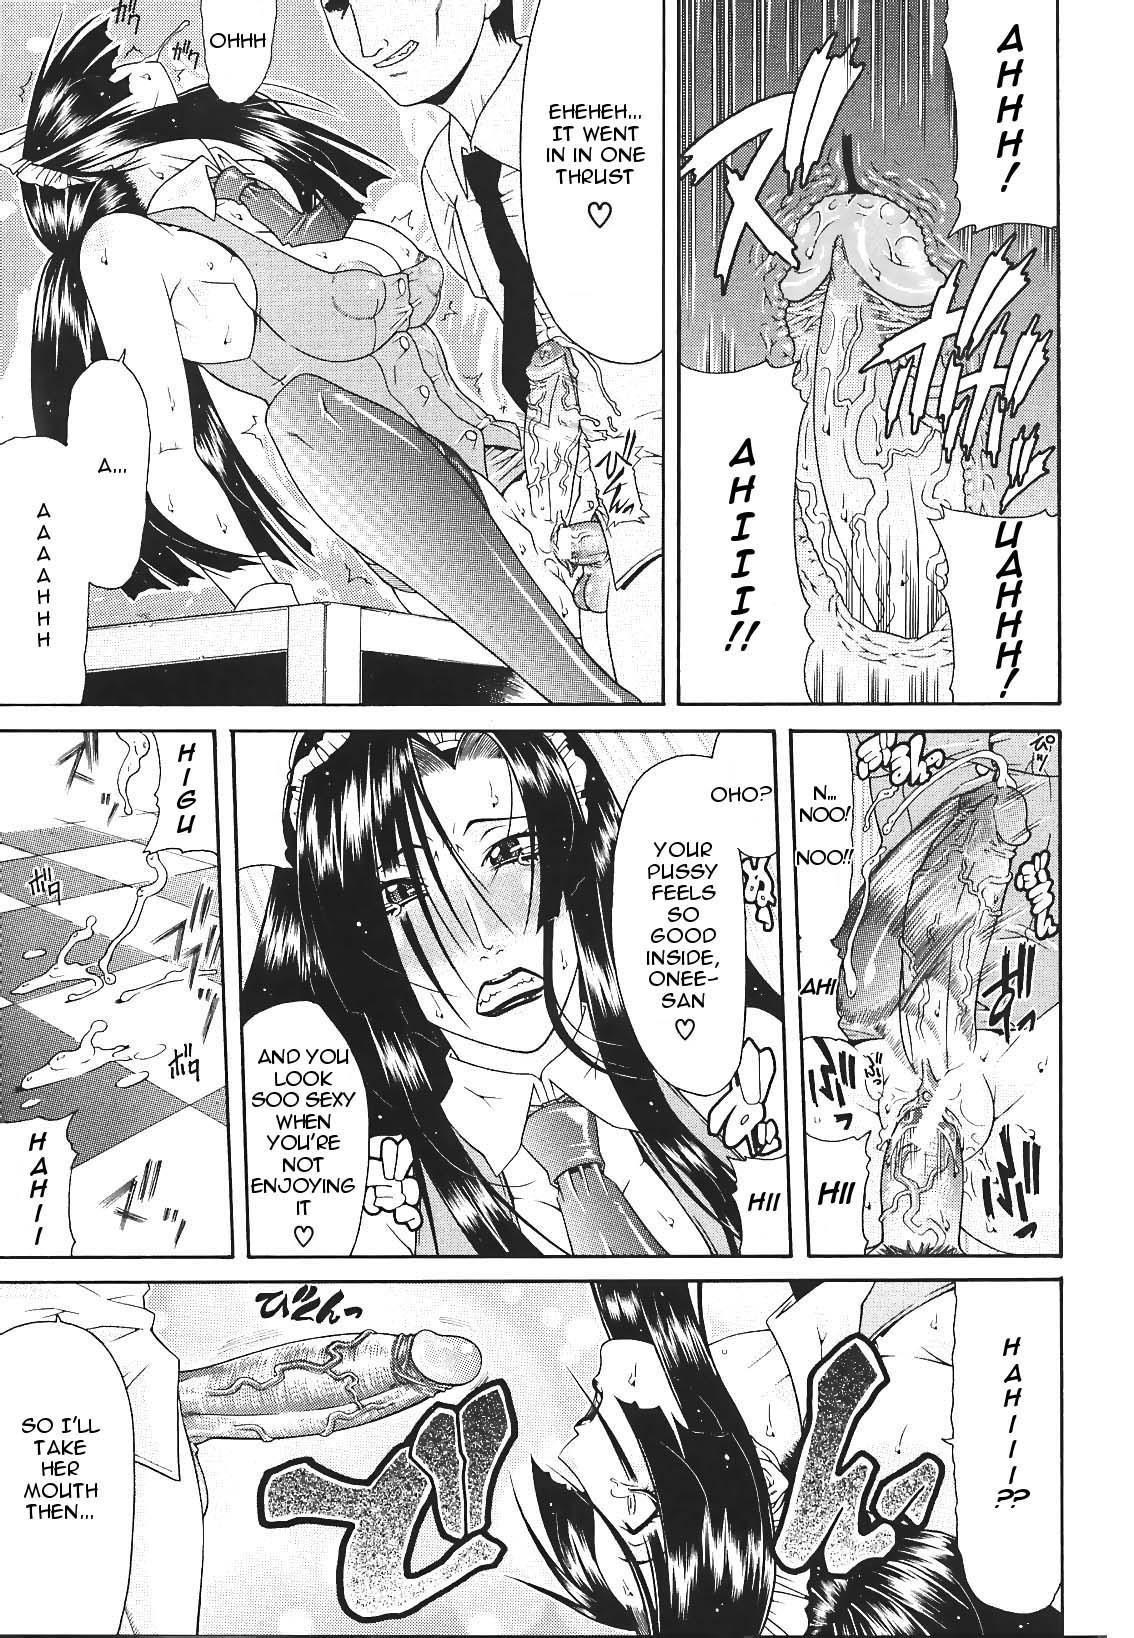 Gura Nyuutou - Escape chapter 7 16